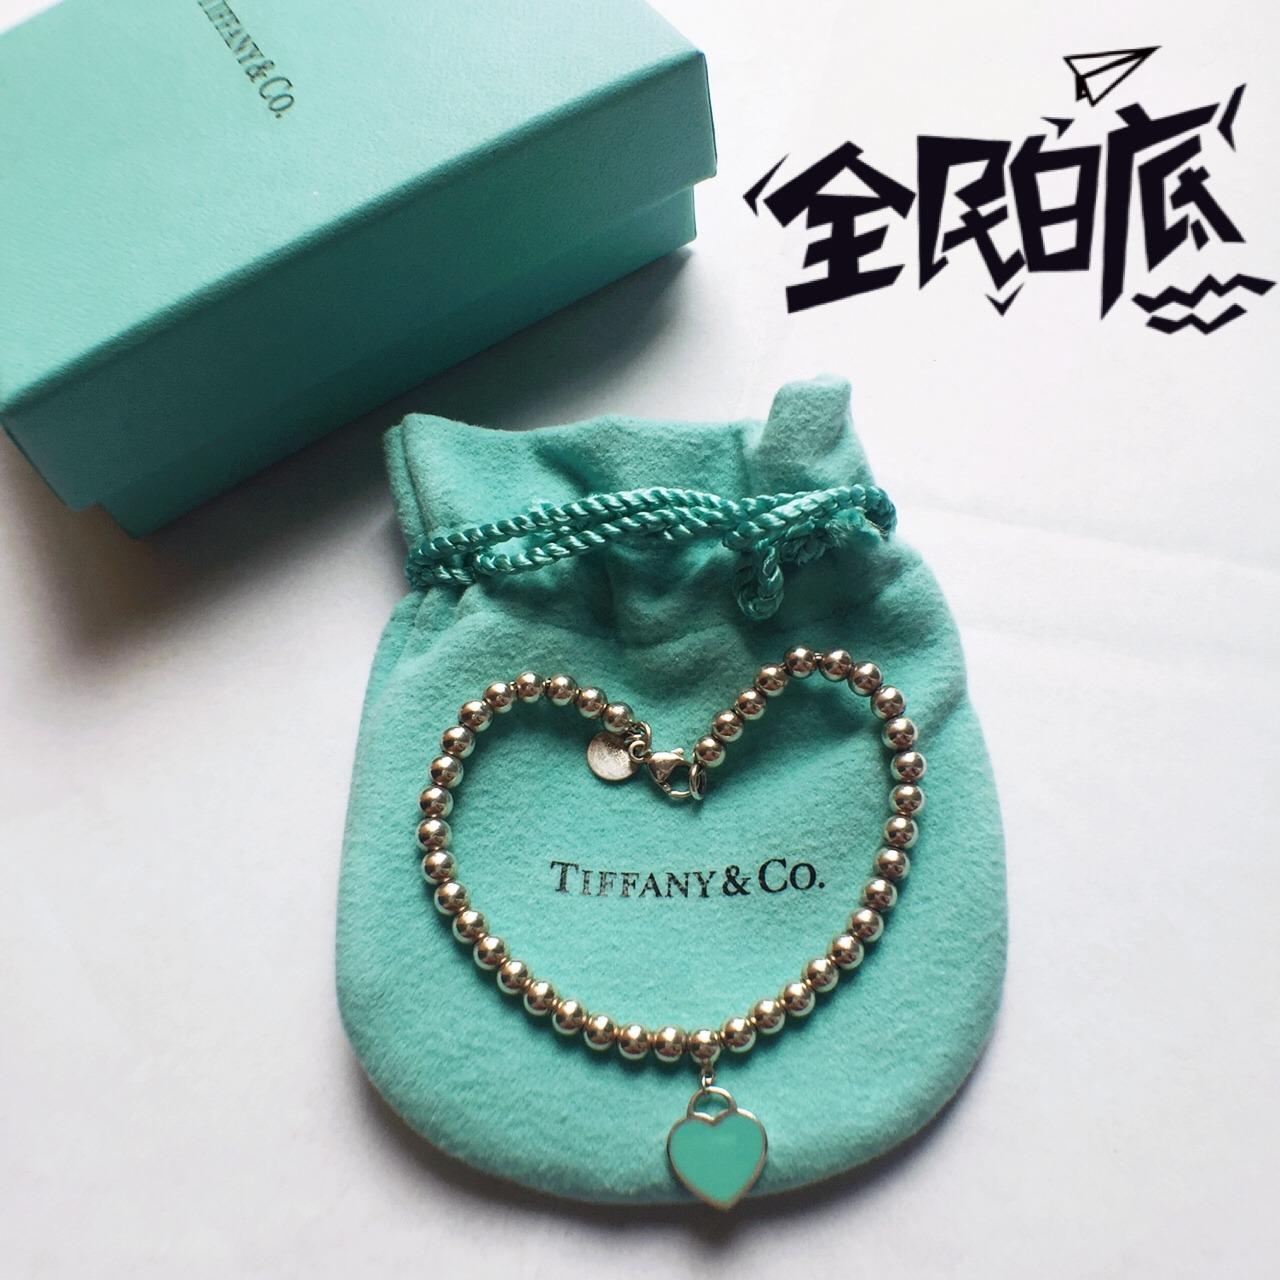 tiffany心形手链图片